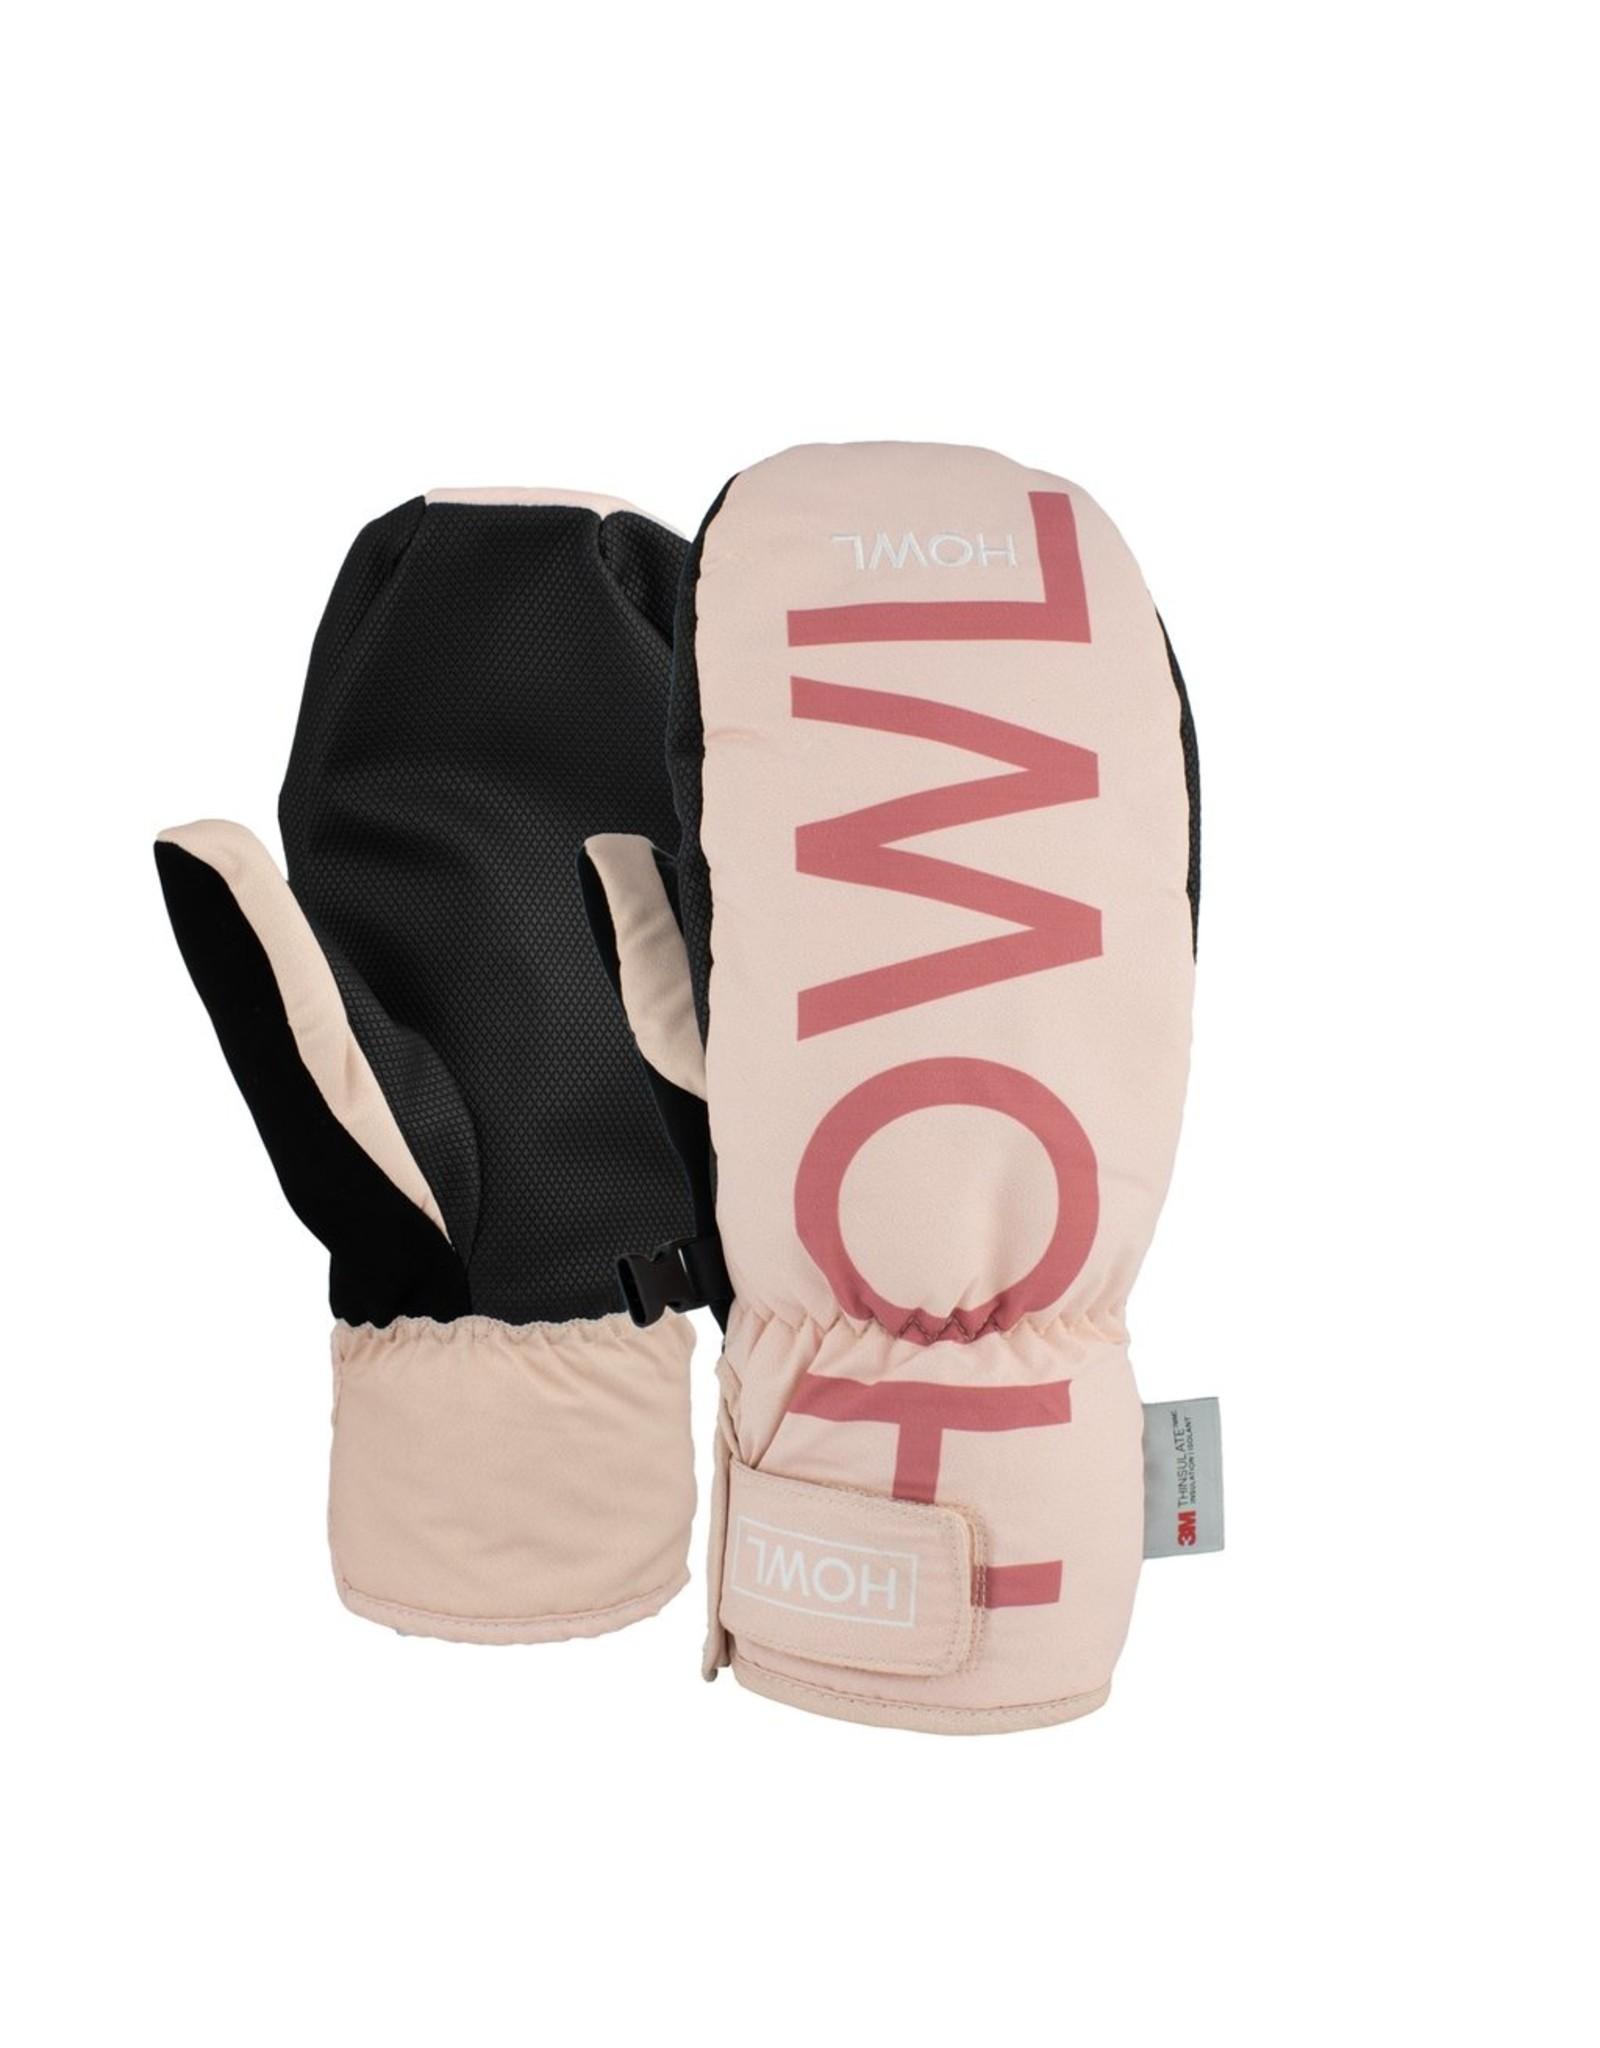 HOWL HOWL - FLYWEIGHT MITT - SALTED ROSE -